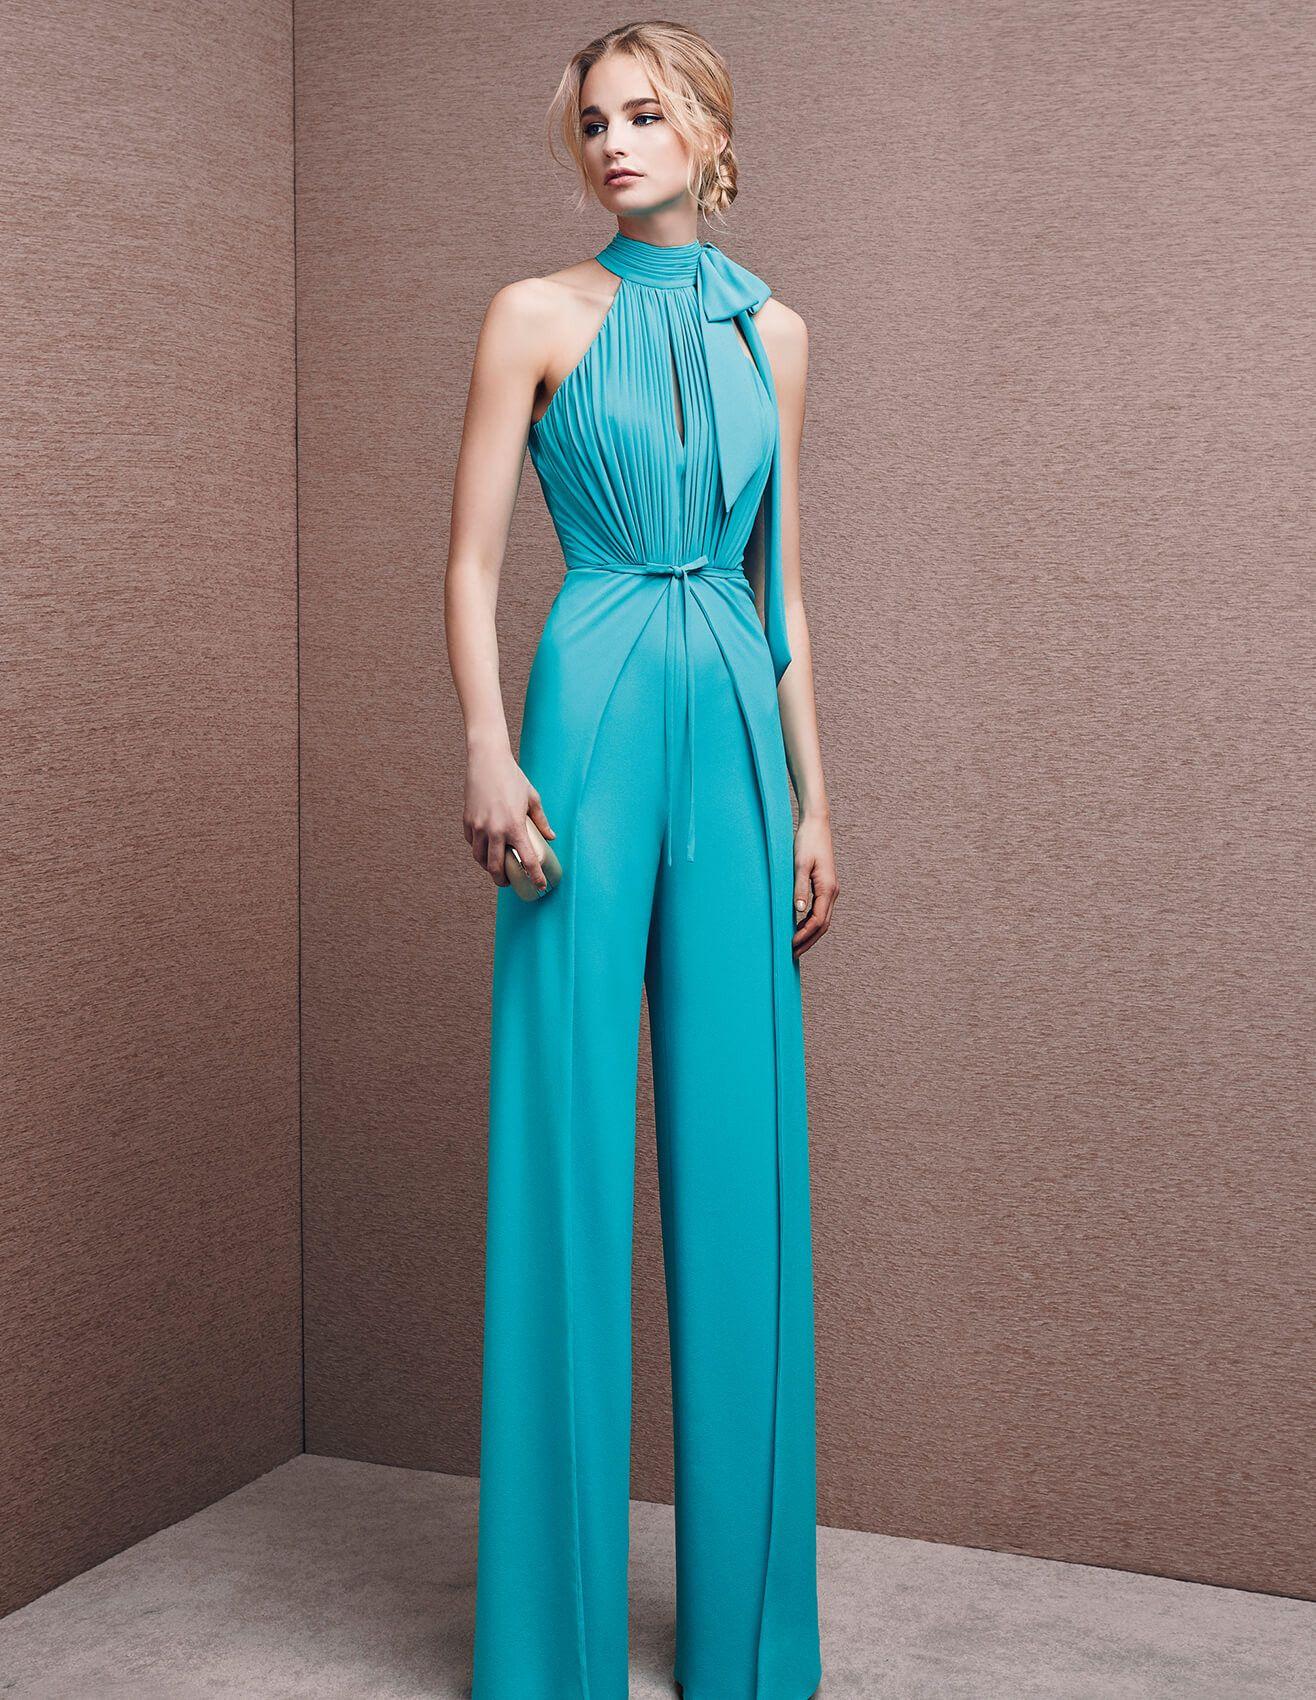 como escoger un atuendo para una boda de dia, mono largo color aguamarina con detalles bonitos